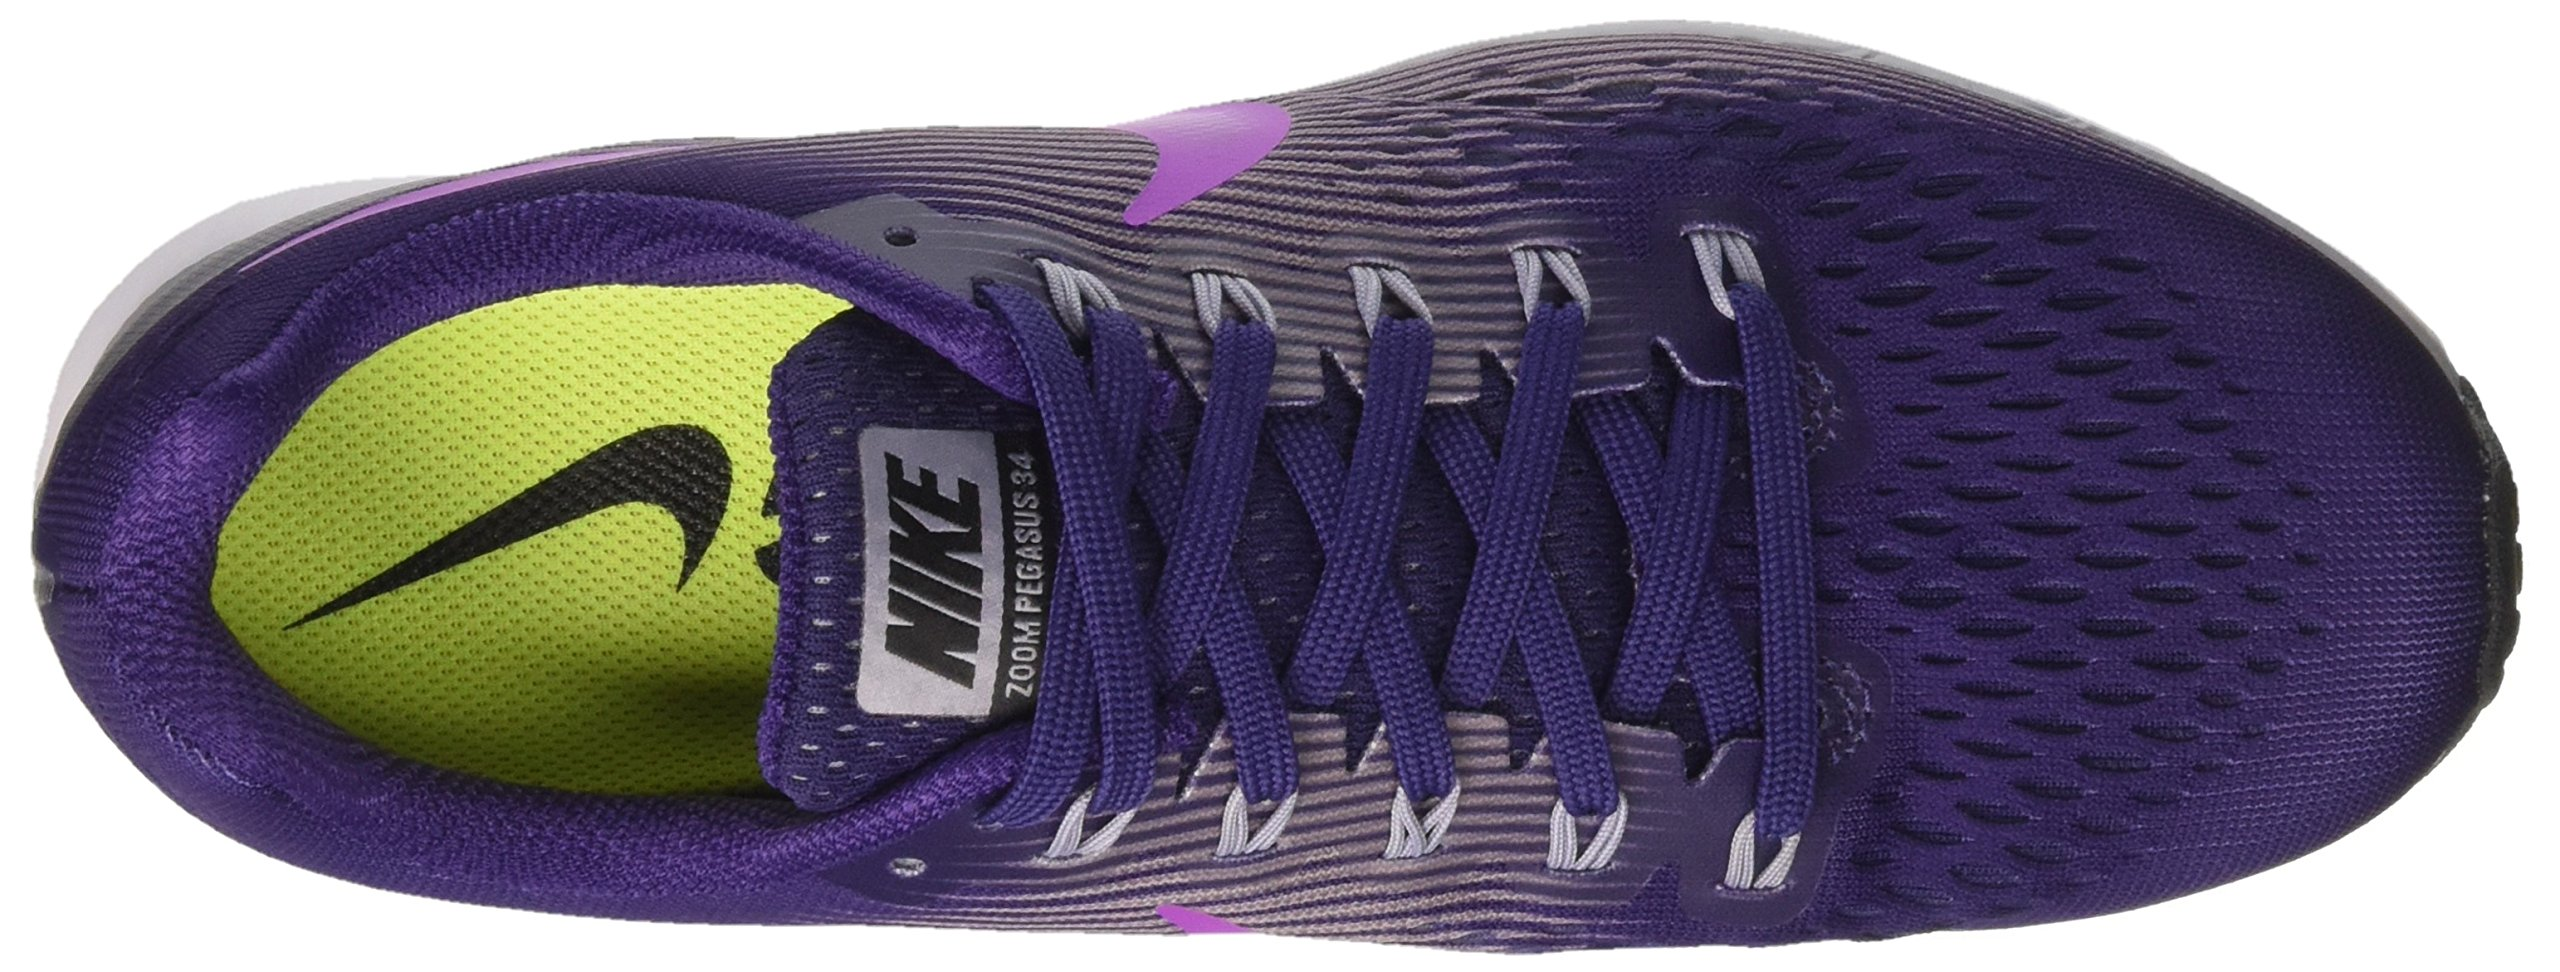 Nike Women's Air Zoom Pegasus 34 Running Shoes-Ink/Hyper Violet-6 by Nike (Image #7)